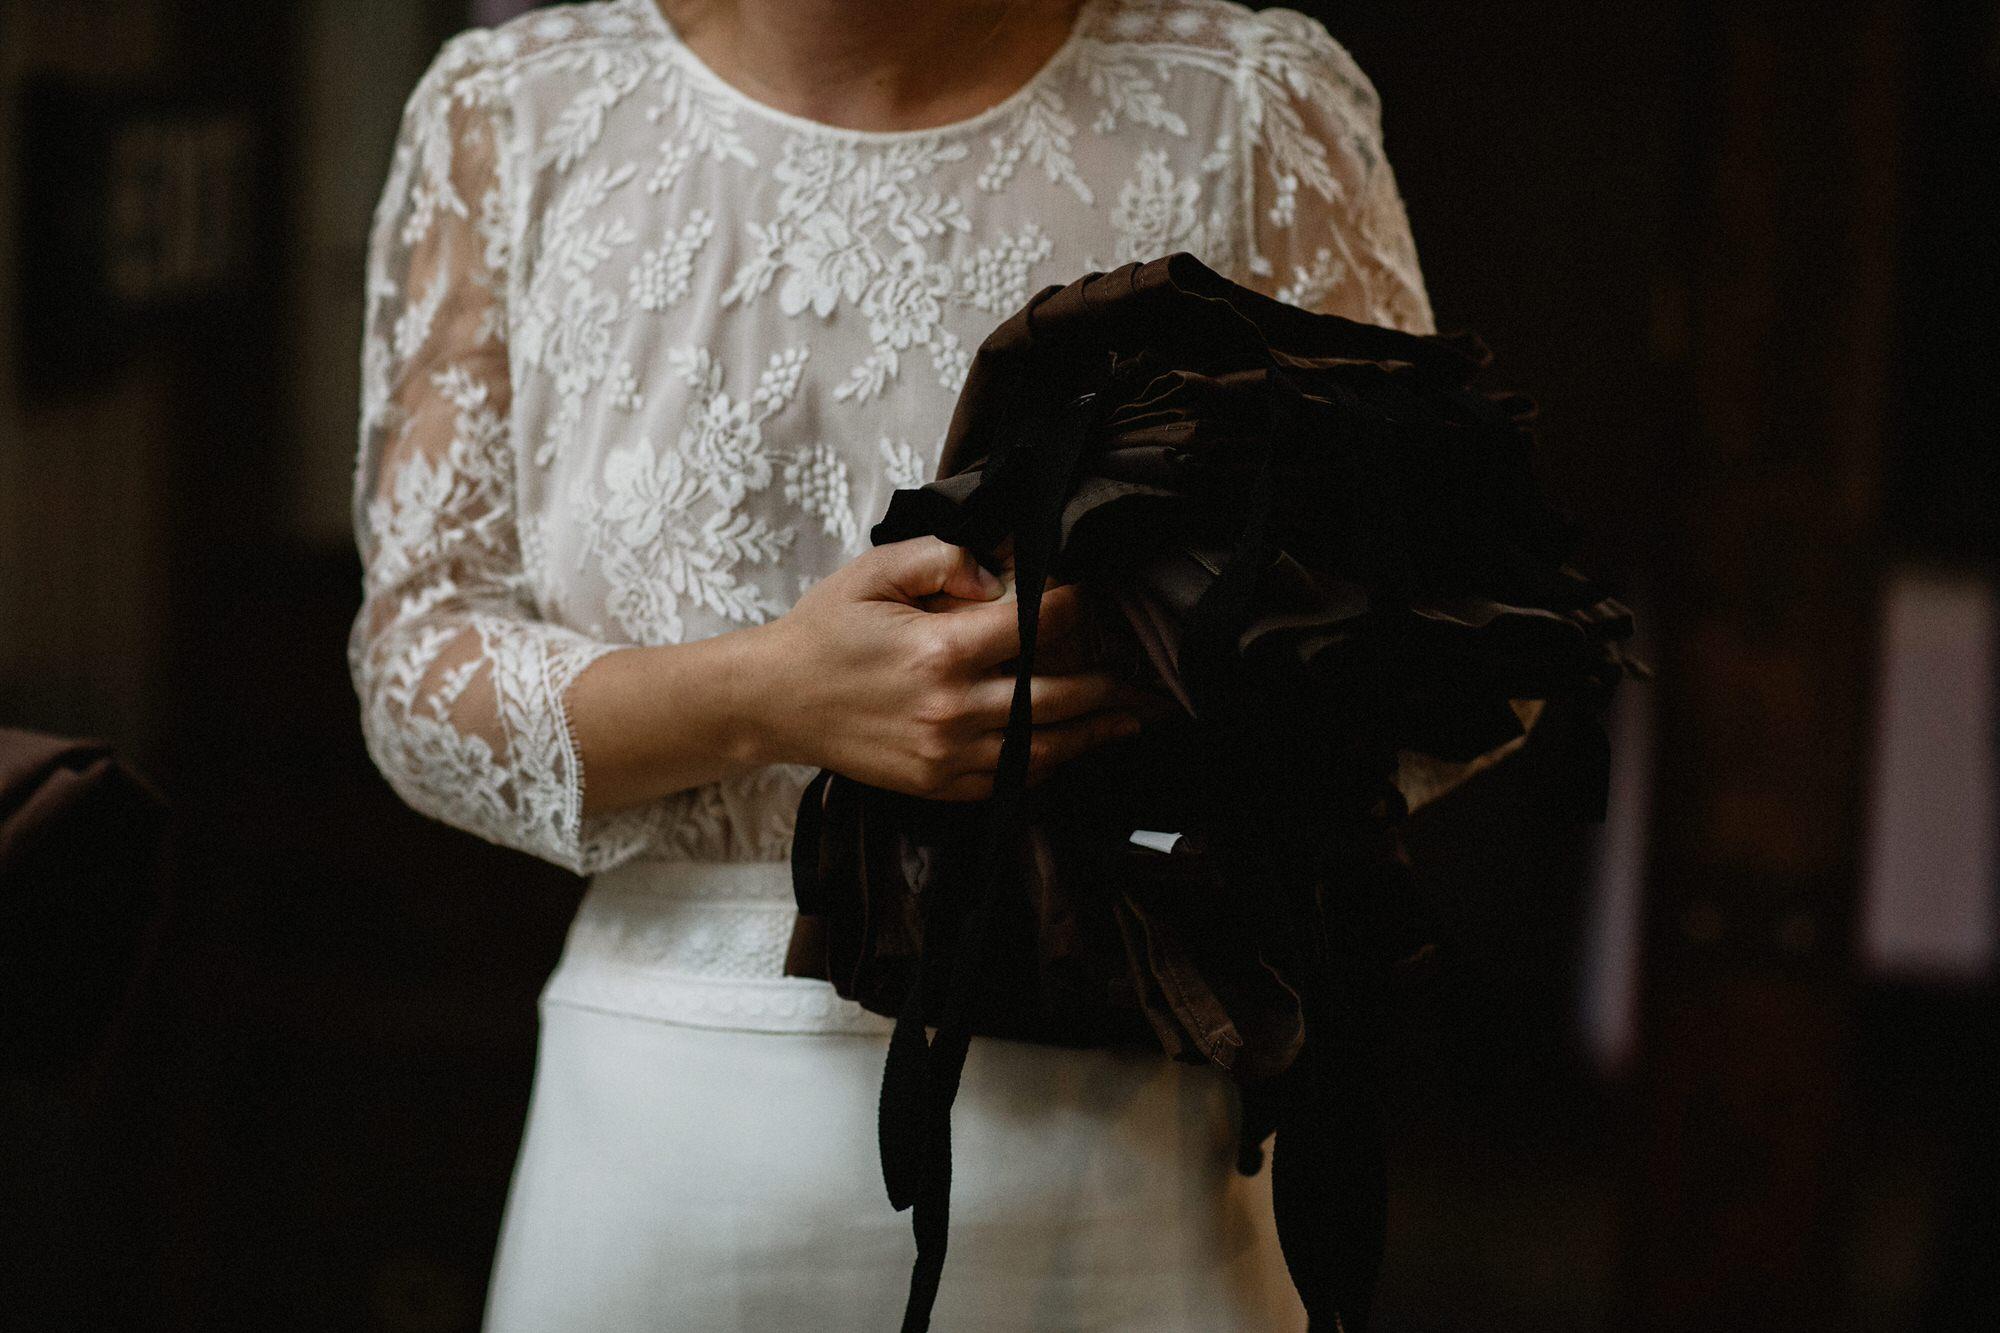 060 TIN SHED KNOCKRAICH WEDDING AUTUMN ZOE ALEXANDRA PHOTOGRAPHY